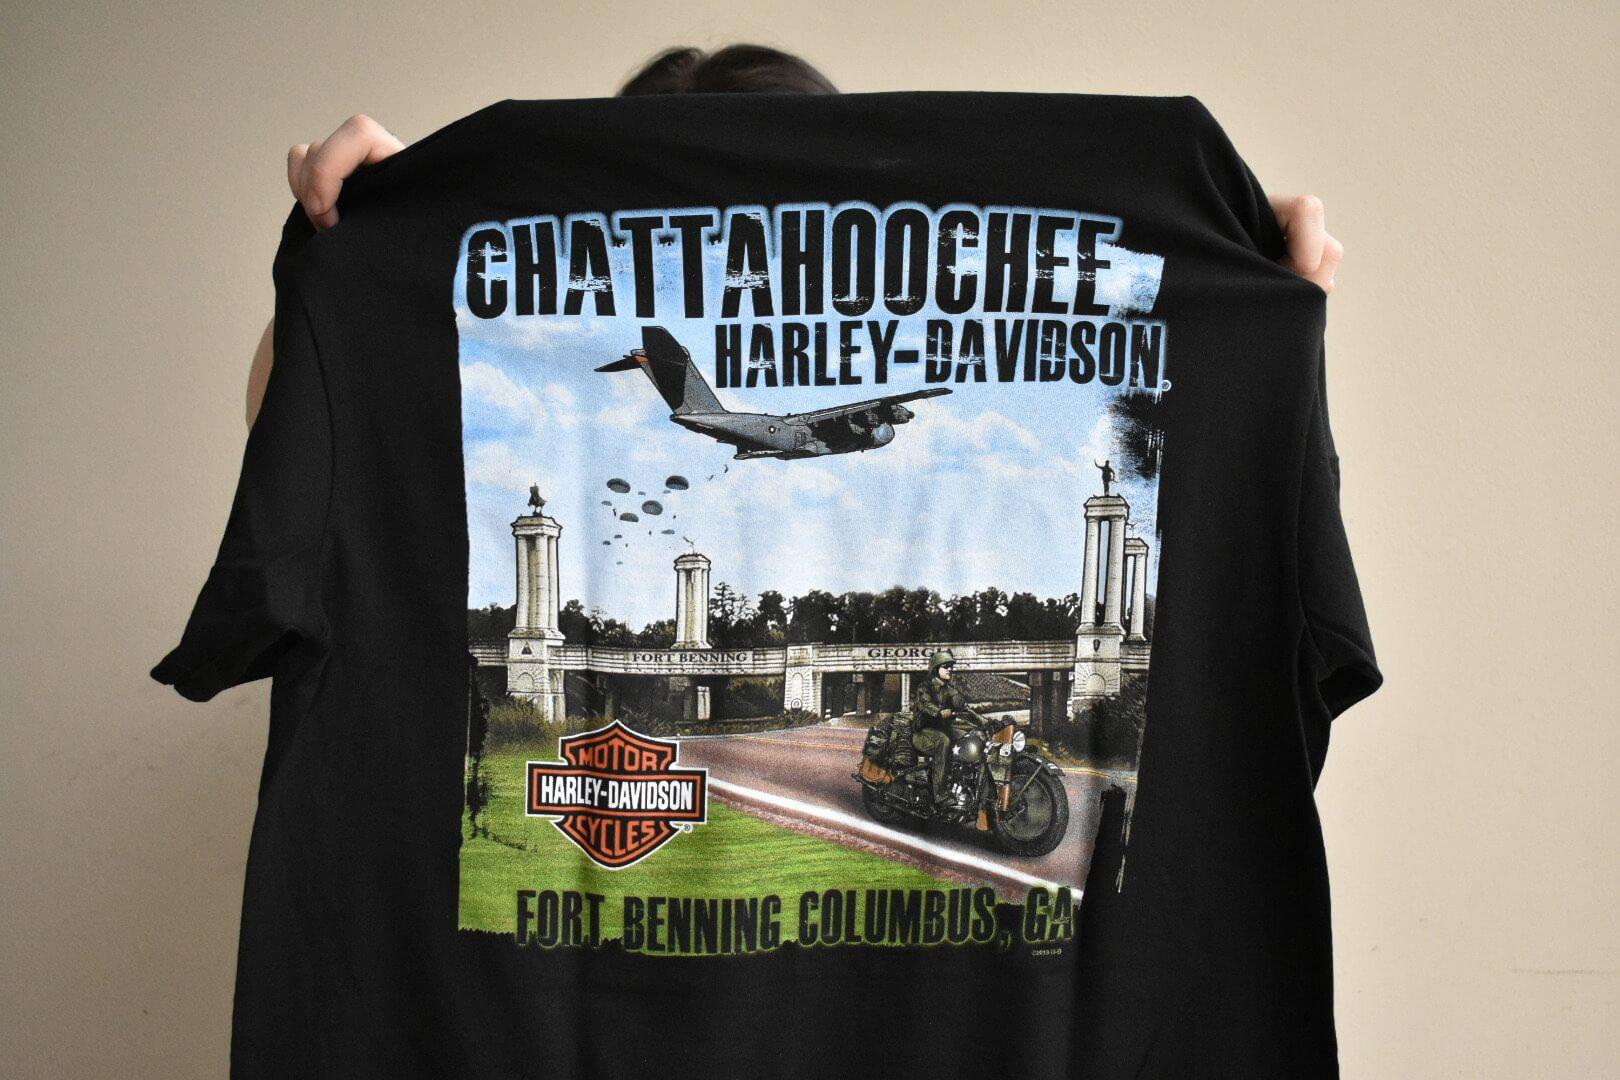 Chattahoochee Harley